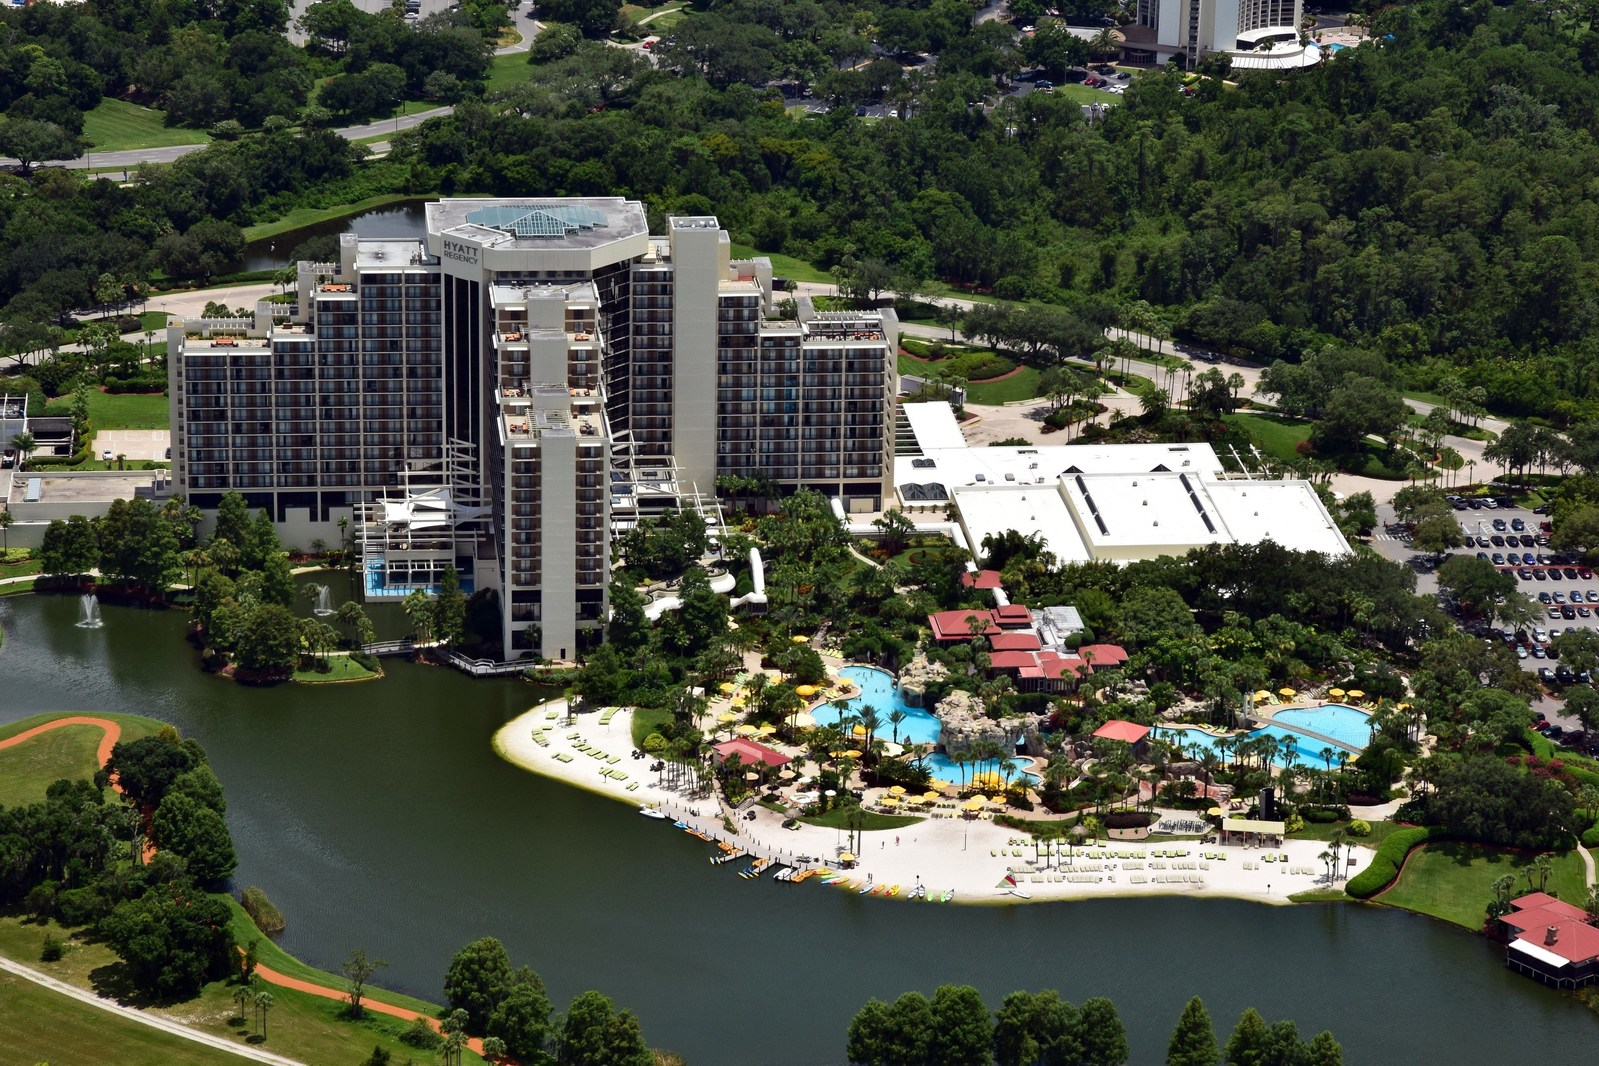 Hyatt Regency Grand Cypress - Orlando, Florida (PRNewsfoto/Xenia Hotels & Resorts, Inc.)